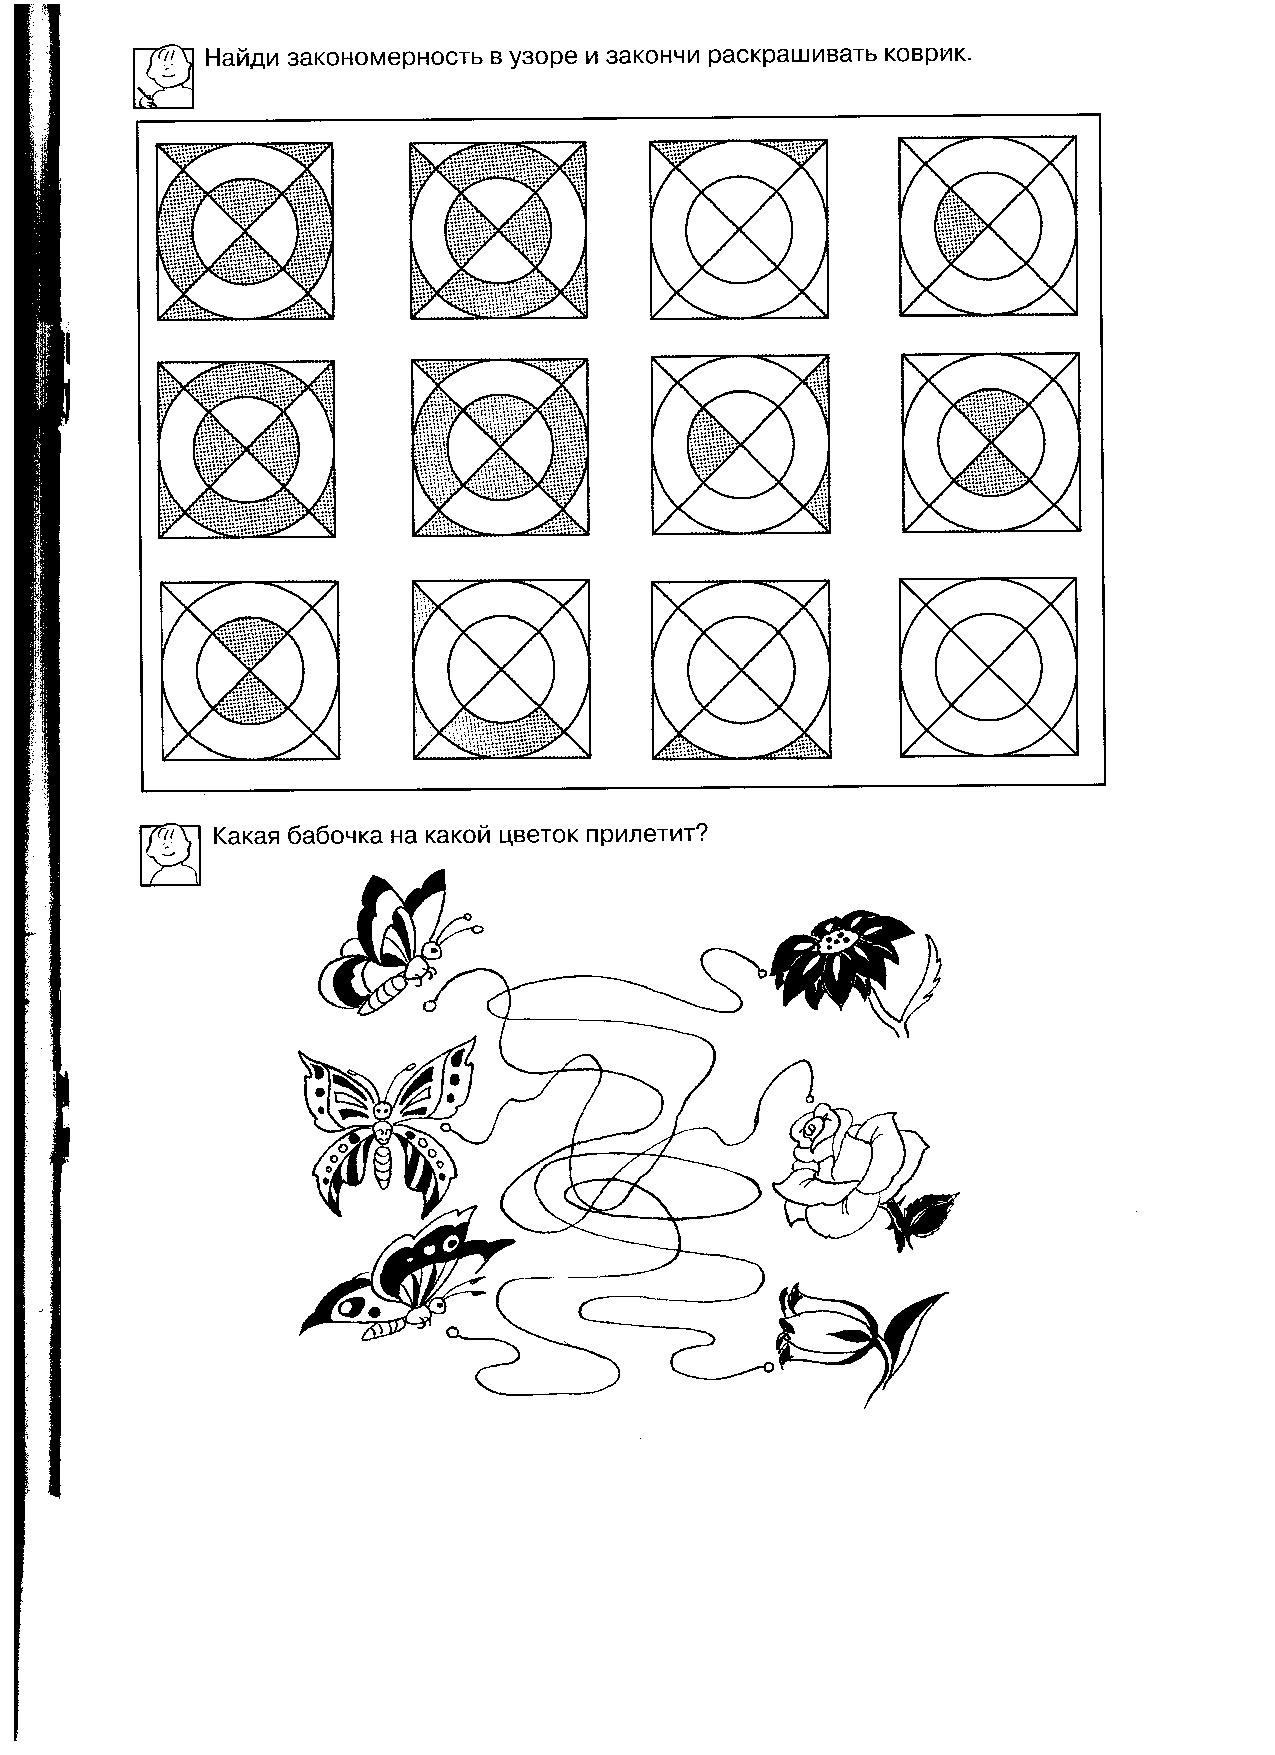 CC61D30B